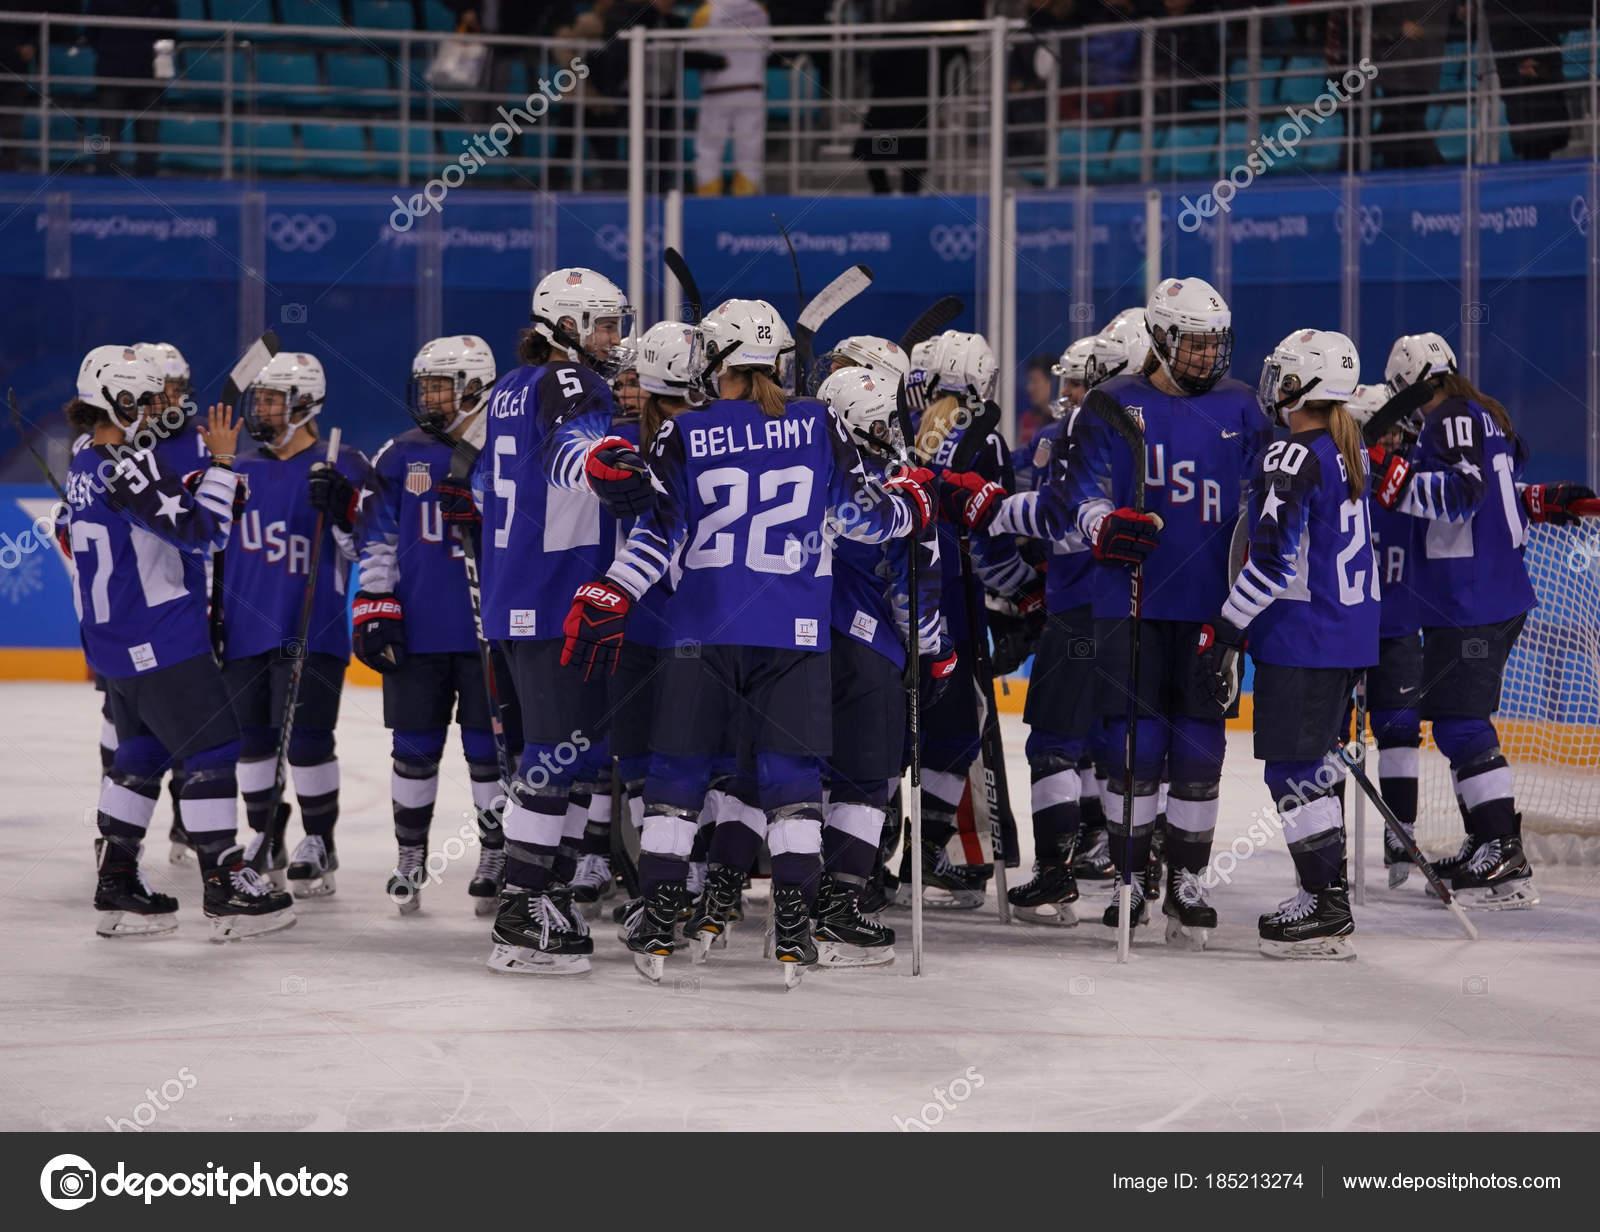 692eabe3eb39 Kwandong Νότια Κορέα Φεβρουαρίου 2018 Ολυμπιονίκης Ομάδα Ηπα ...